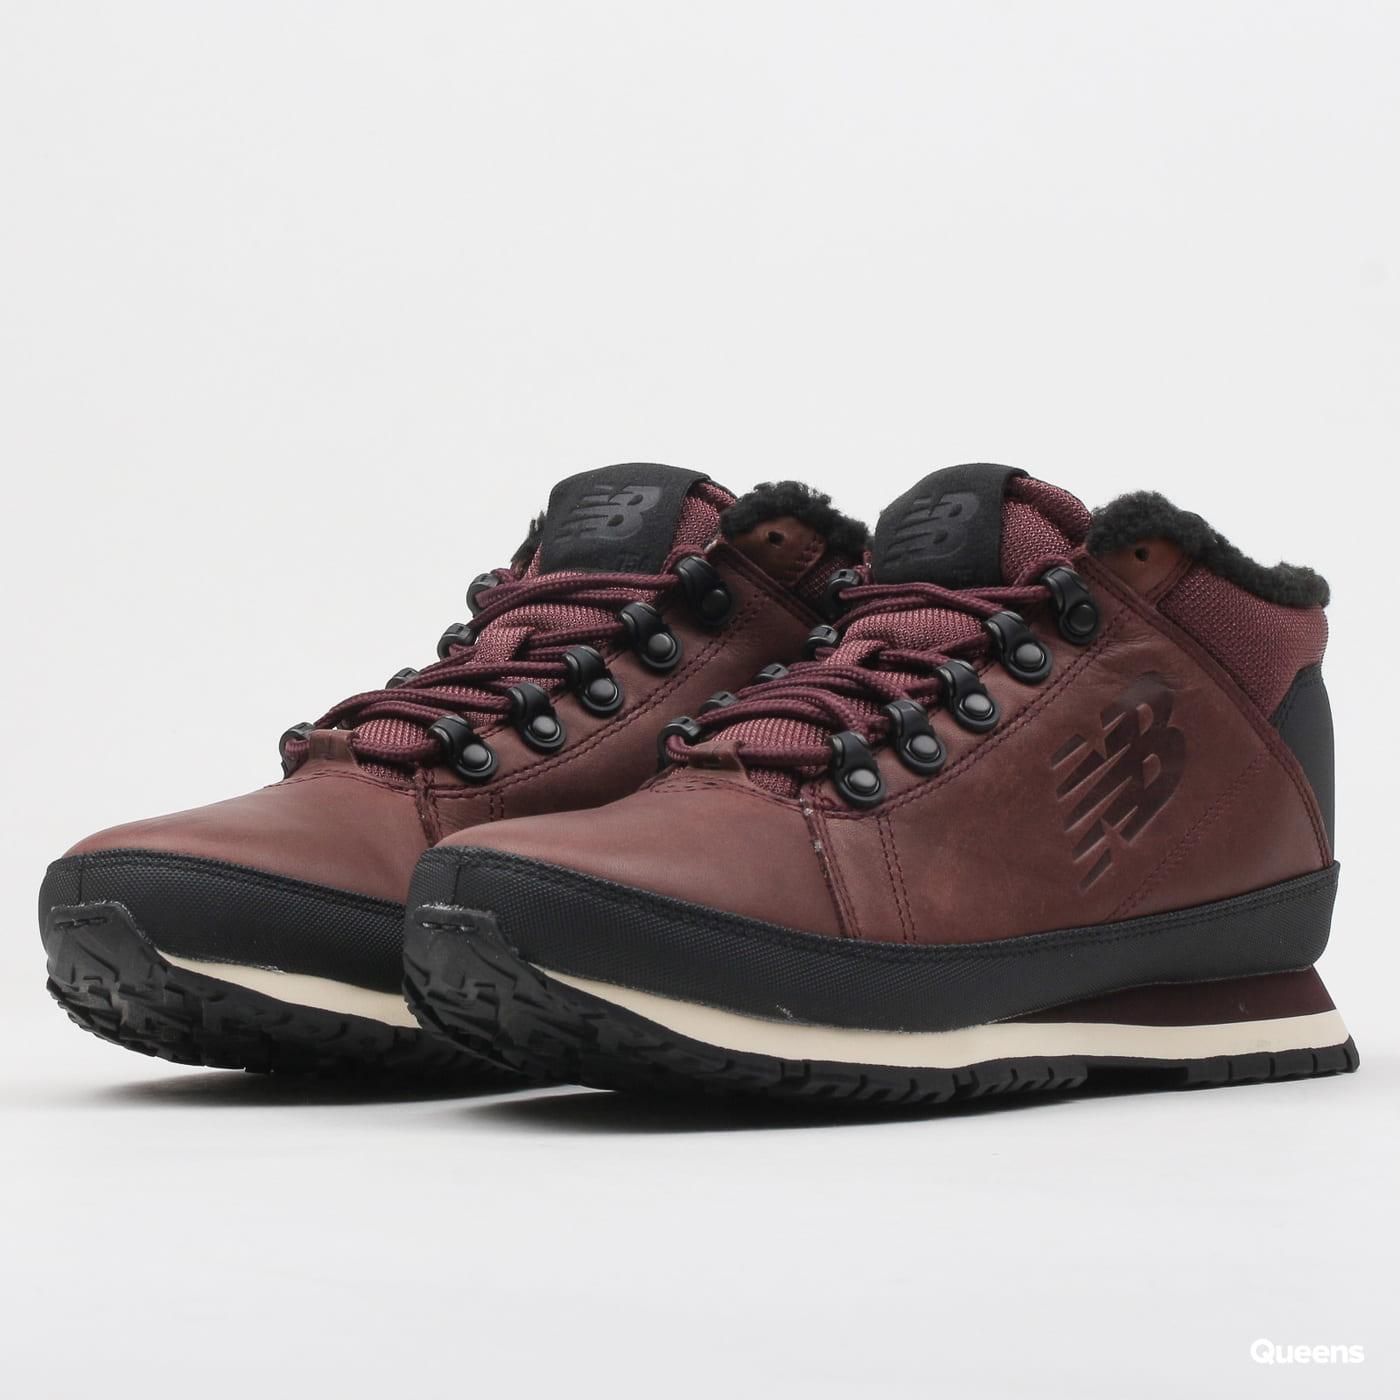 00583d1ffc4ae Pánska zimná obuv New Balance HL754BB – Queens 💚